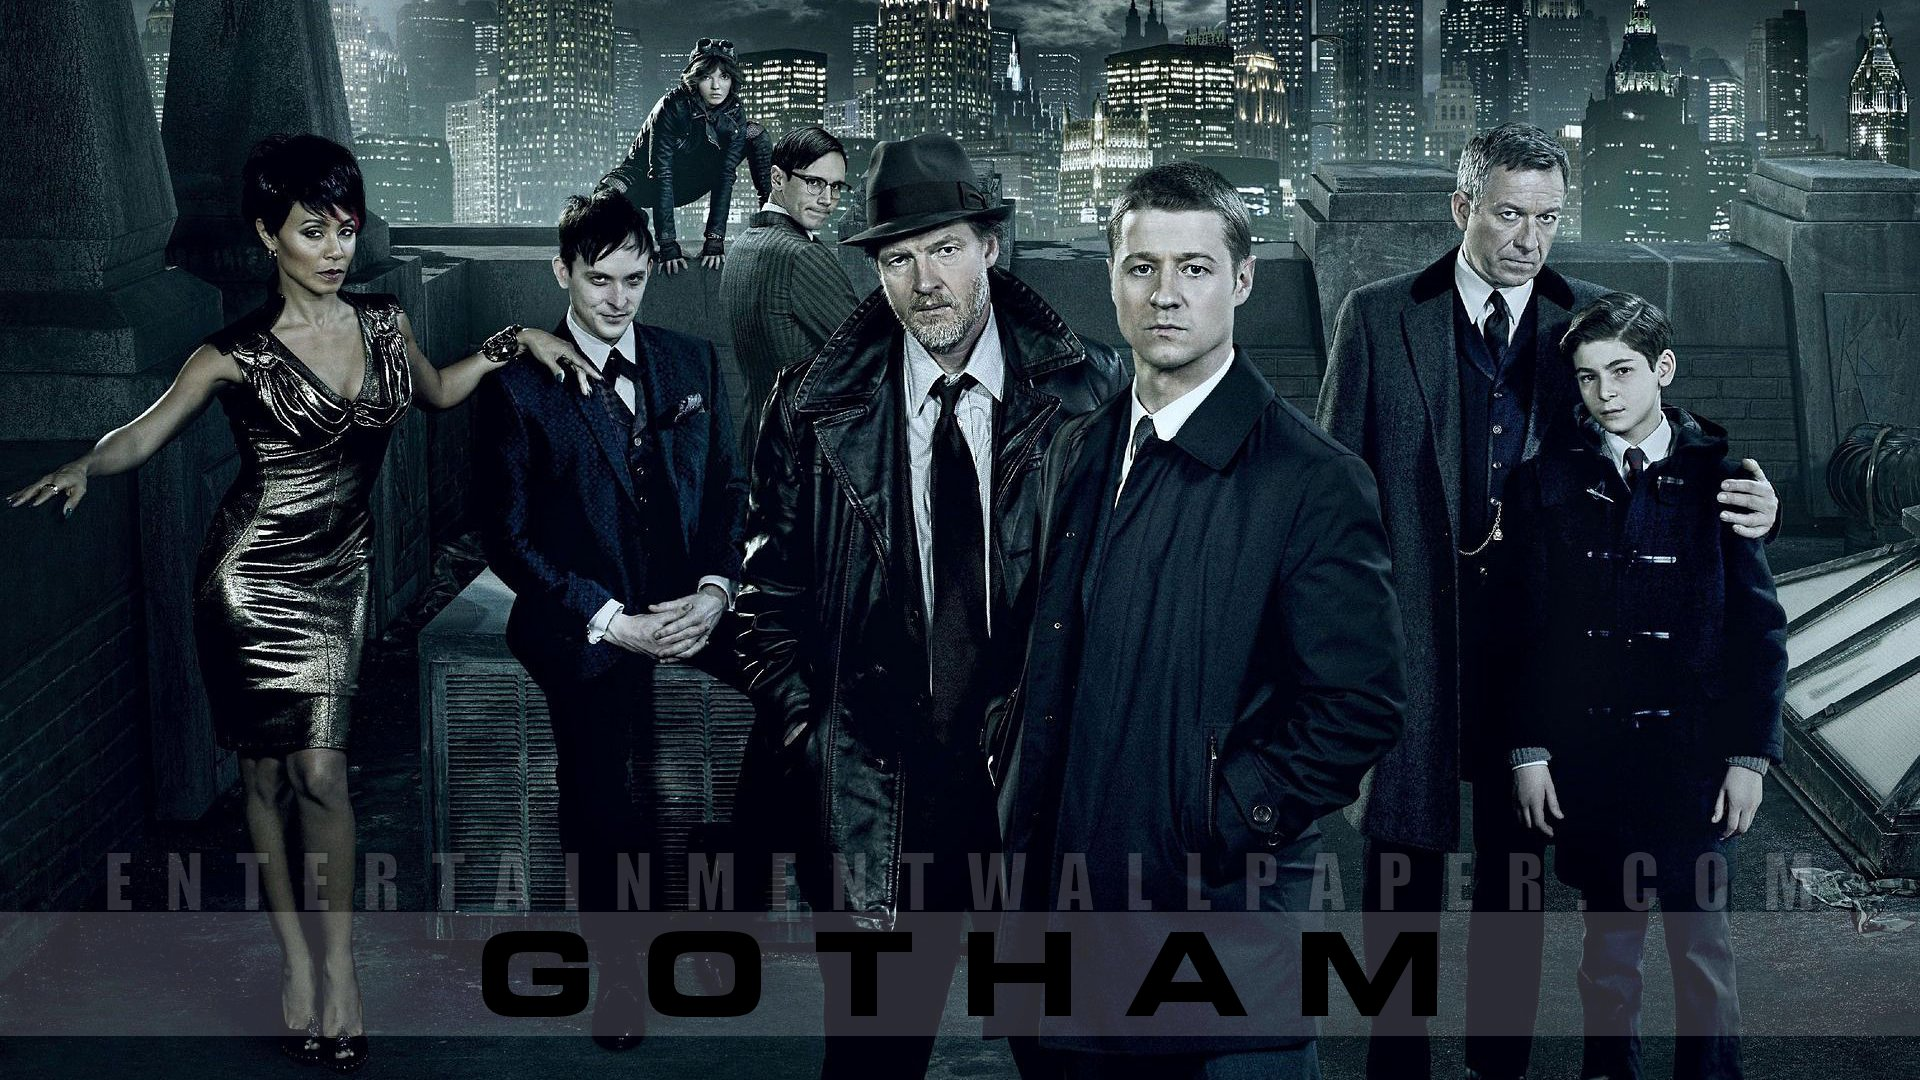 Gotham WallPapers 1920x1080